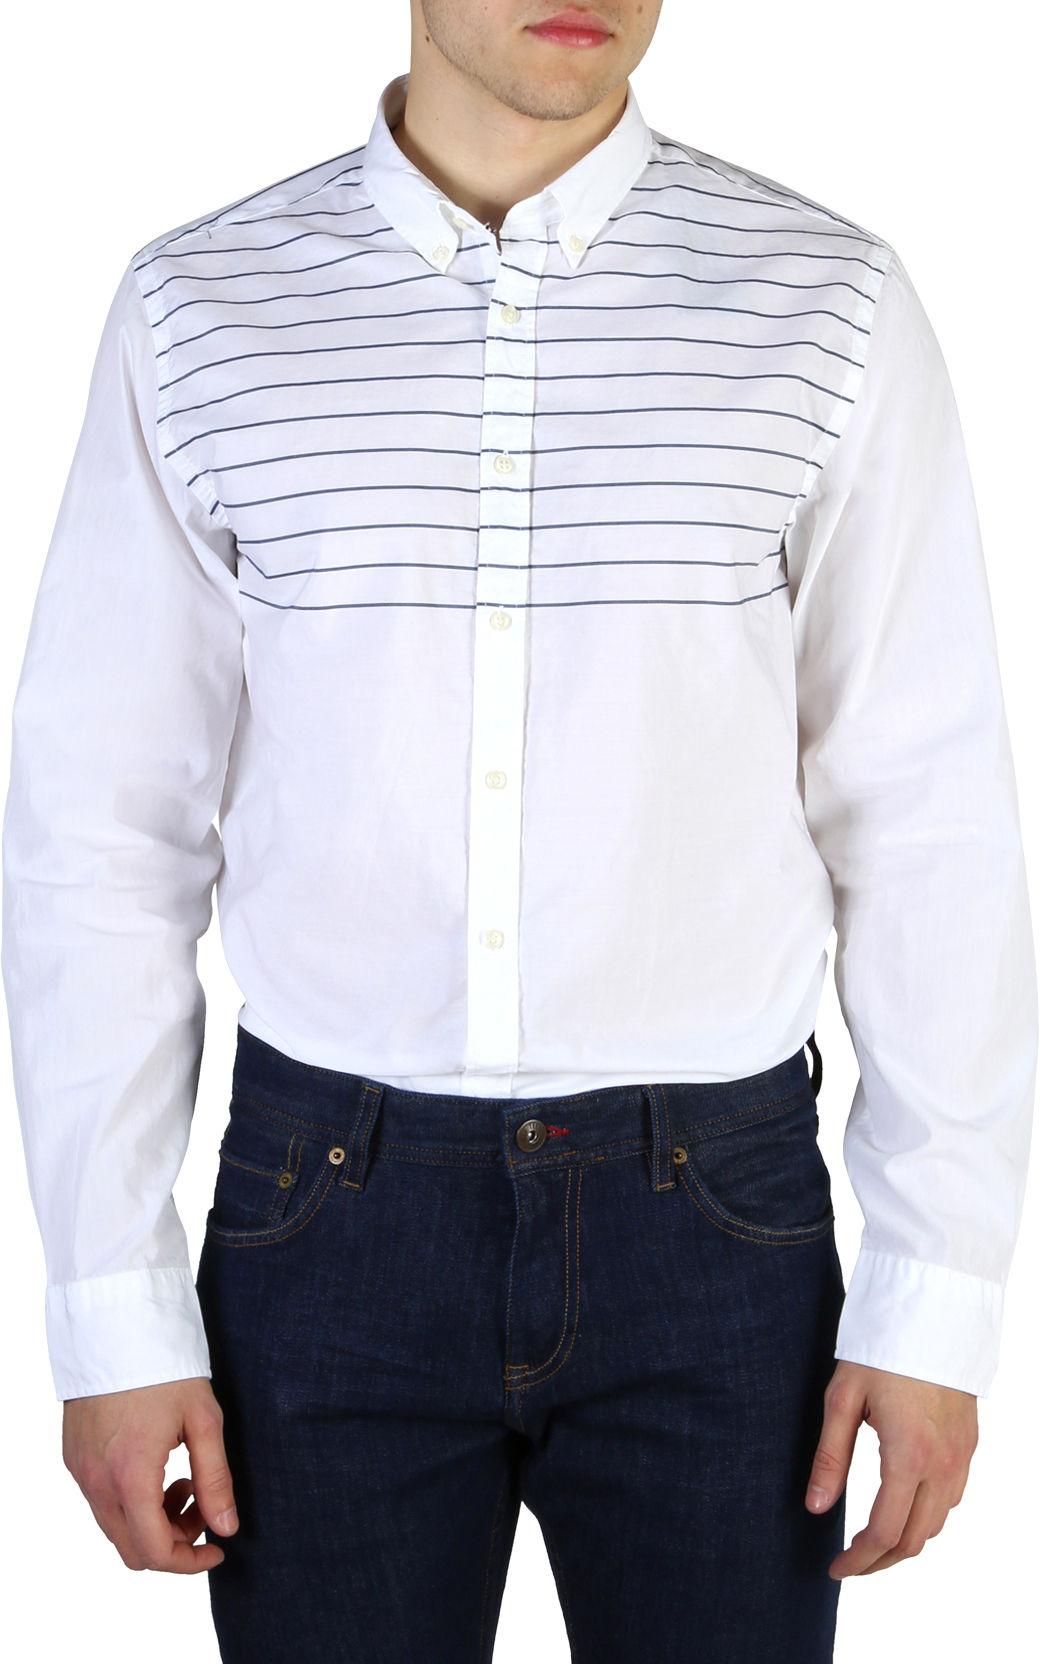 Koszule męskie Tommy Hilfiger